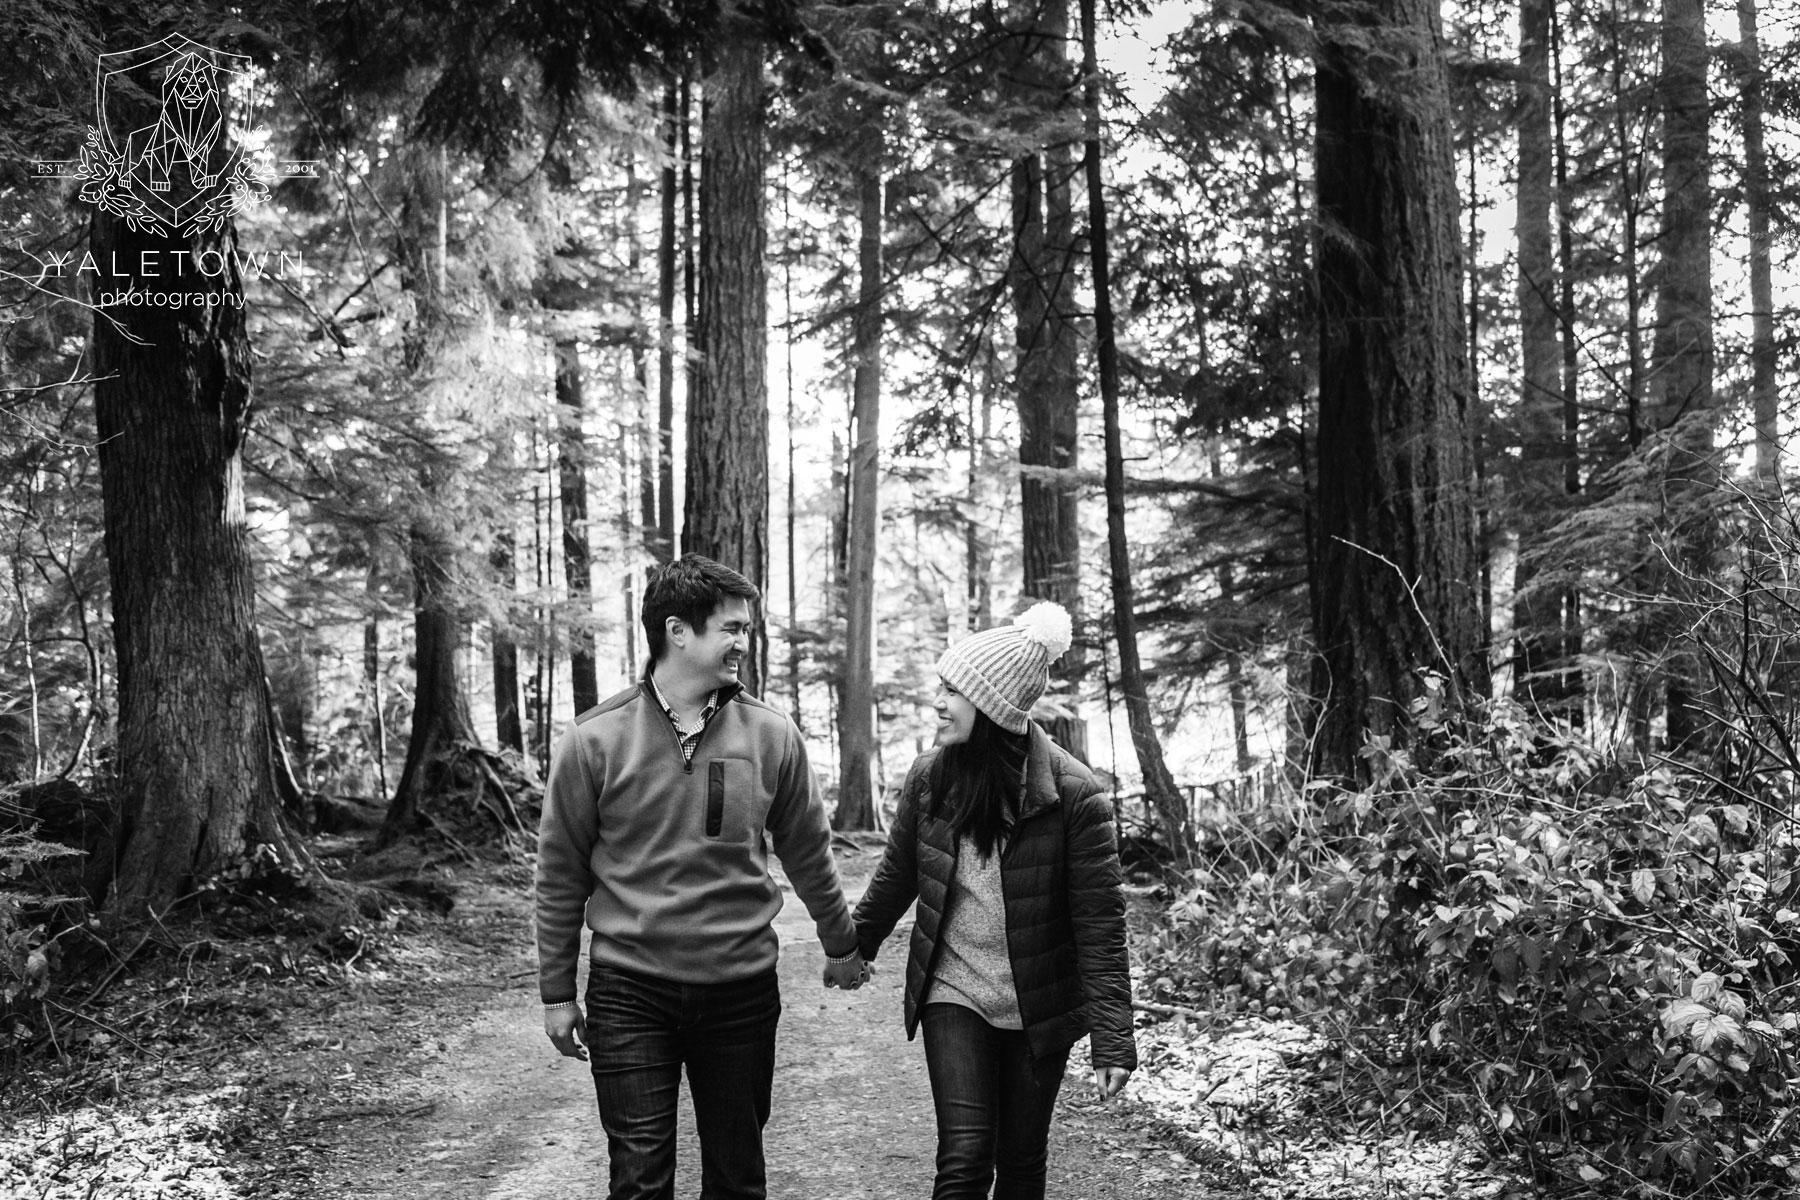 Wedding-Proposal-Vancouver-Stanley-Park-Wedding-Photographer-Vancouver-Yaletown-Photography-Photo-16.JPG